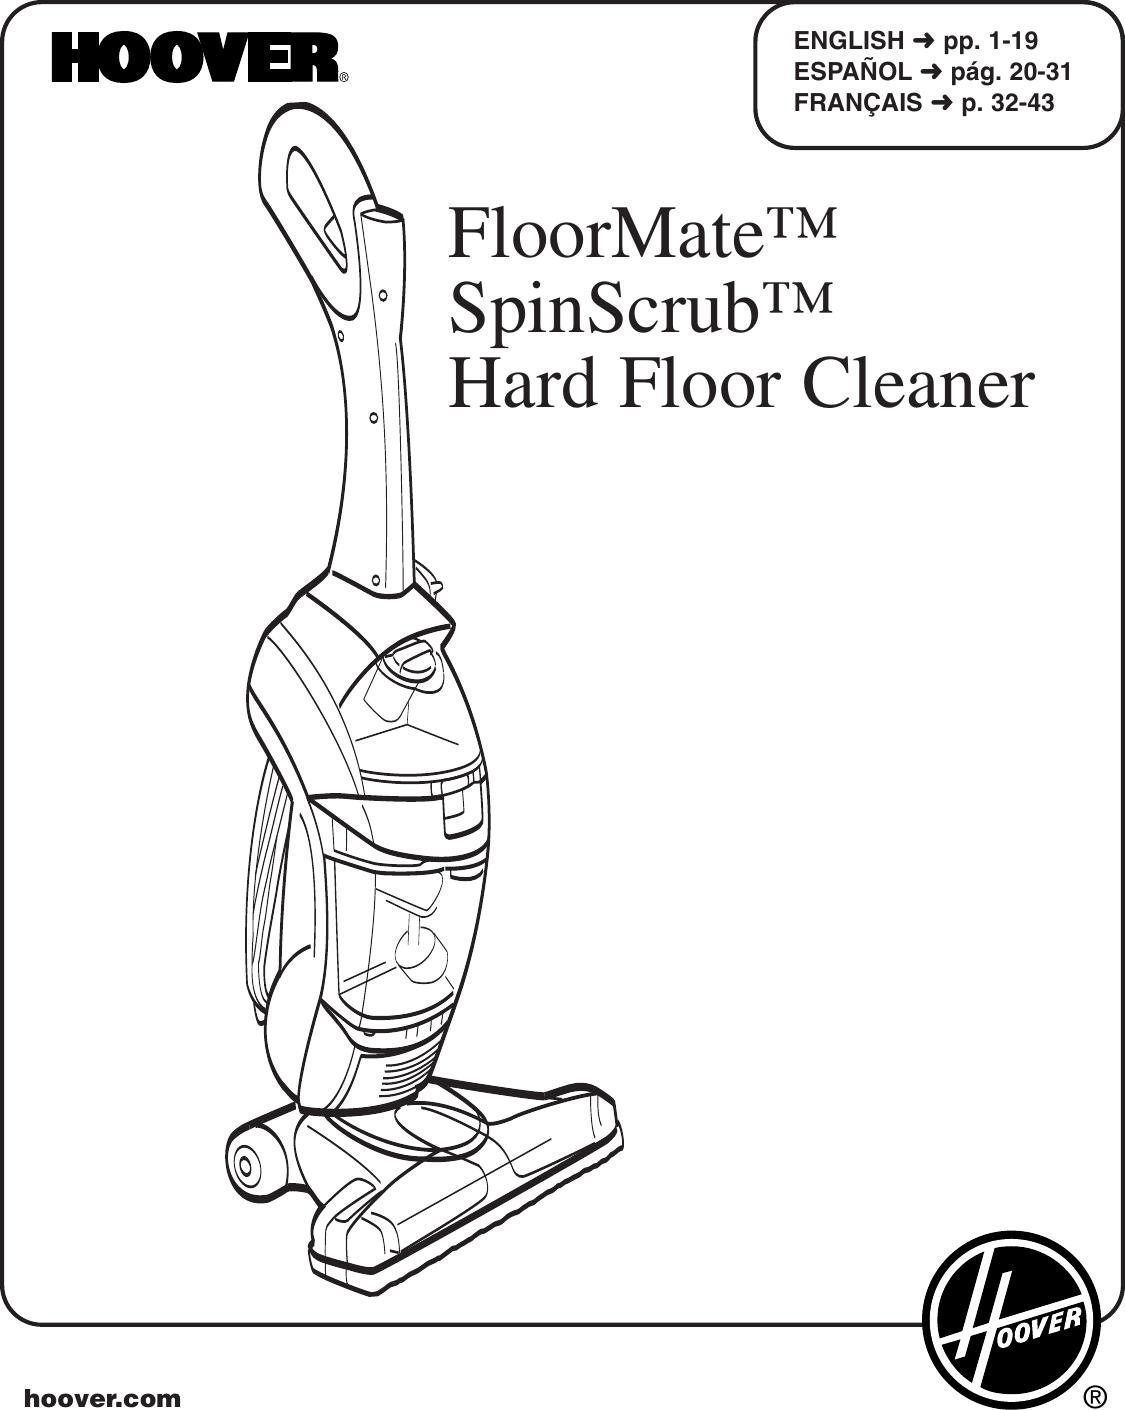 Floormate Spinscrub Aspirateur